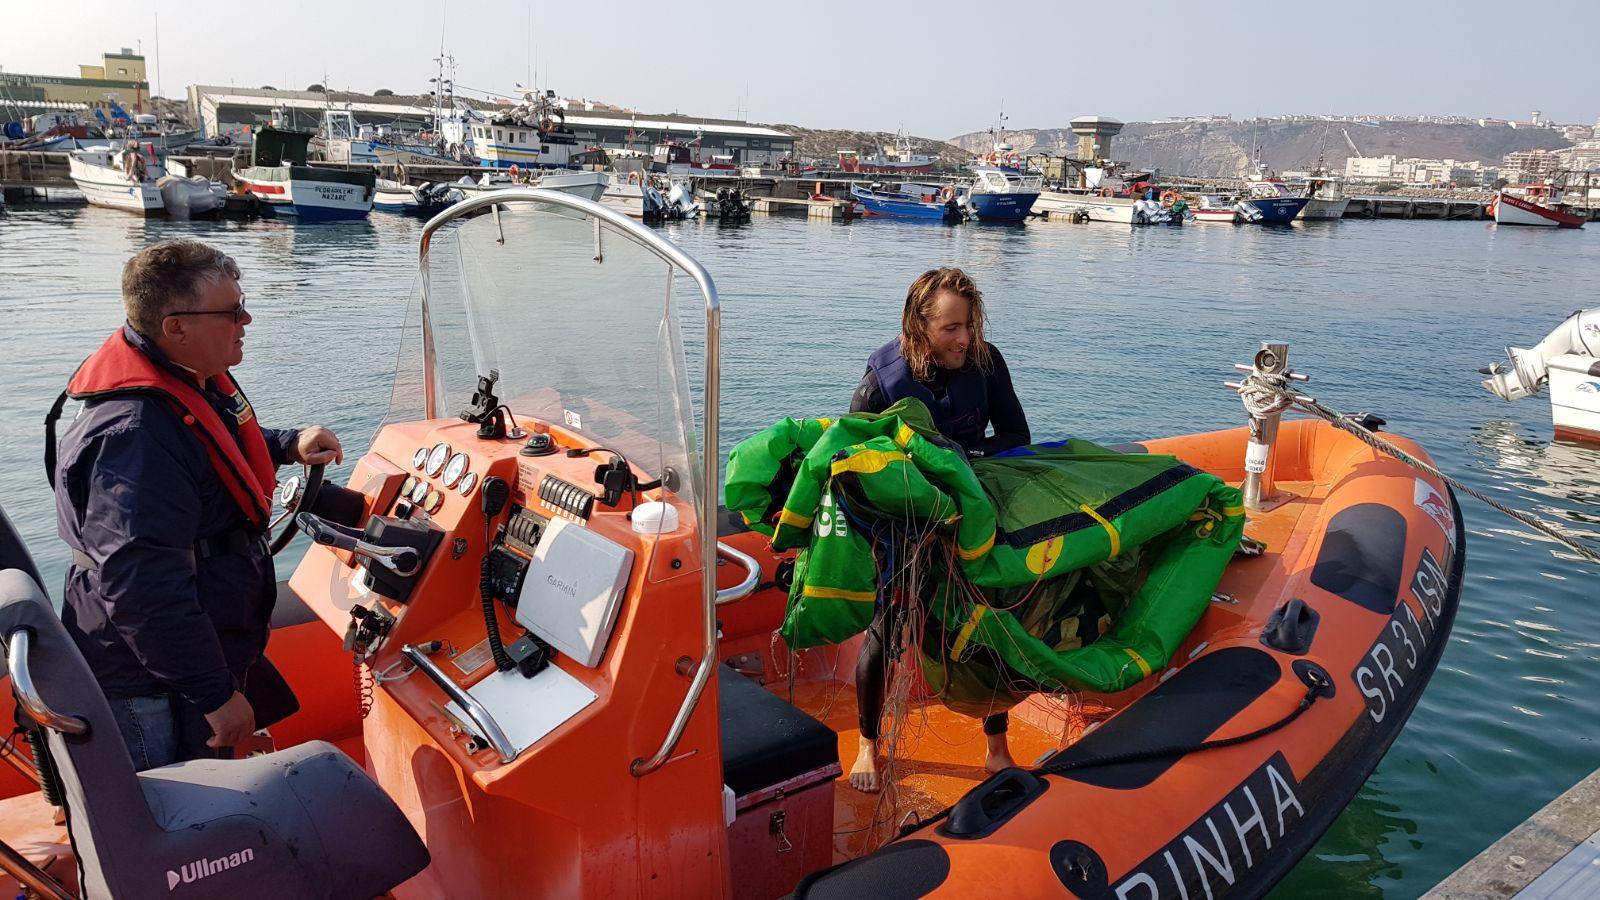 praticante kitesurf nazare resgate2